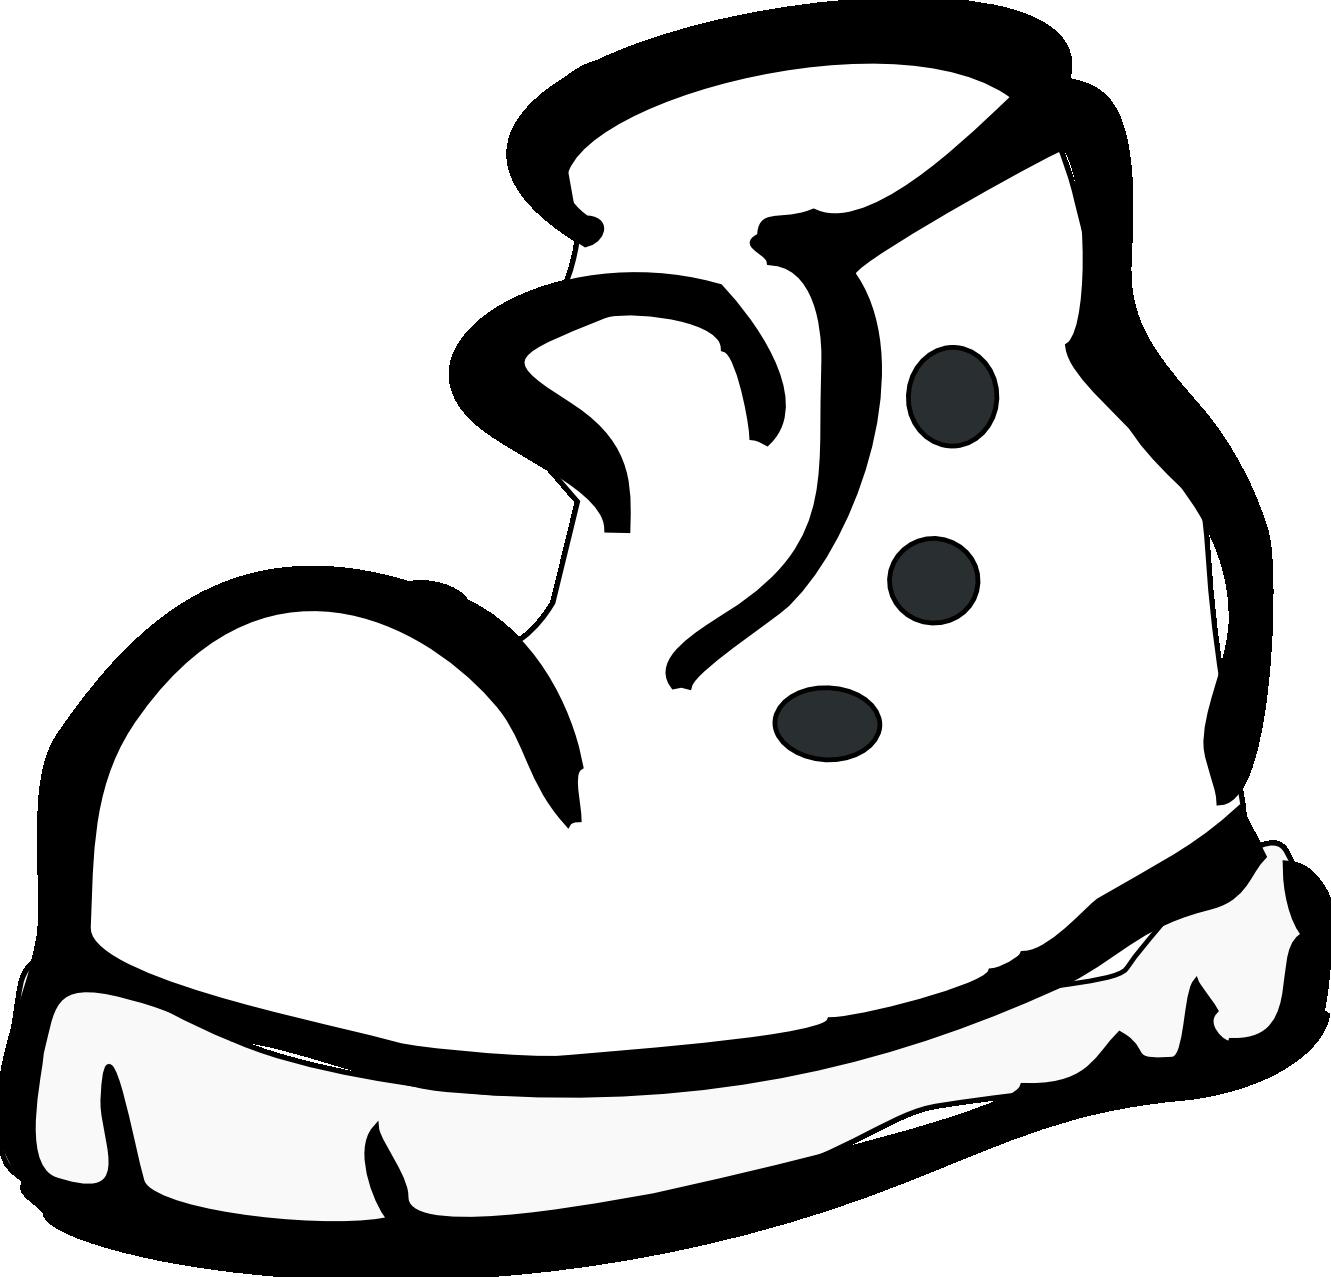 ... outline clip art shoe print outline clip art sneaker outline clip art